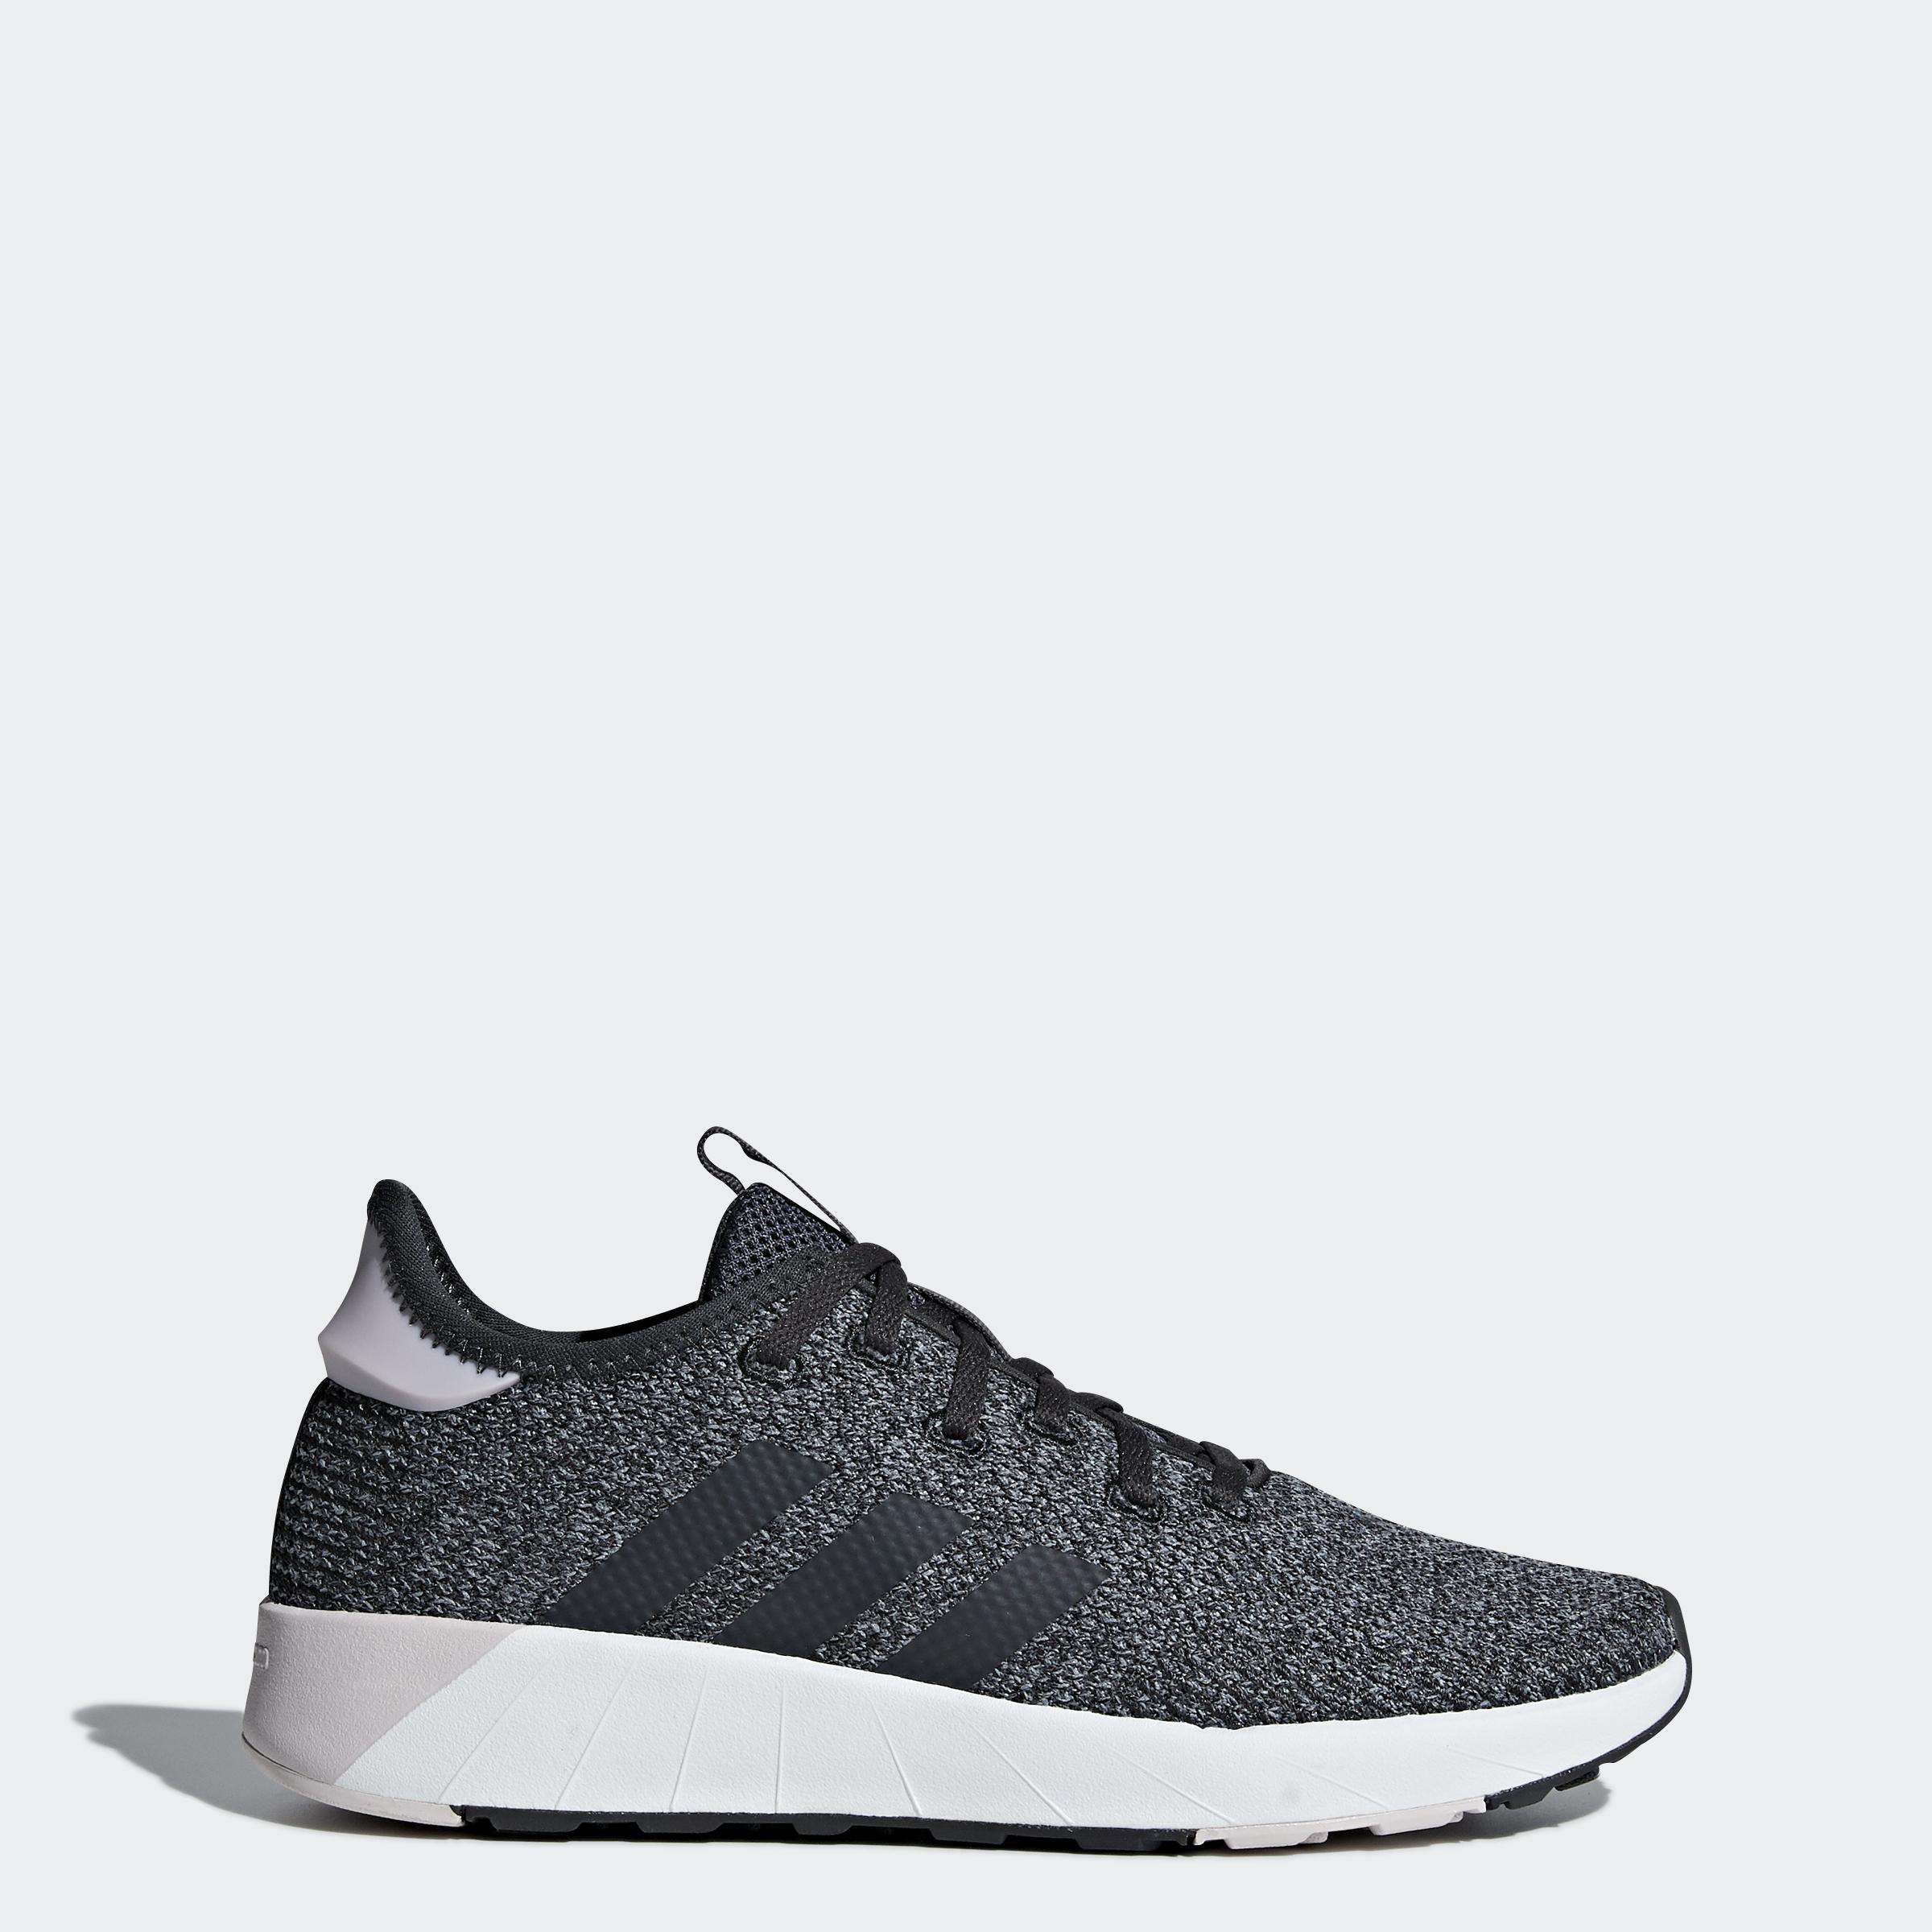 adidas Women's Original Questar X BYD Shoe 2 for $43.18 ($21.59 each), adidas Men's Originals Kamanda Shoe $41.20 + Free Shipping